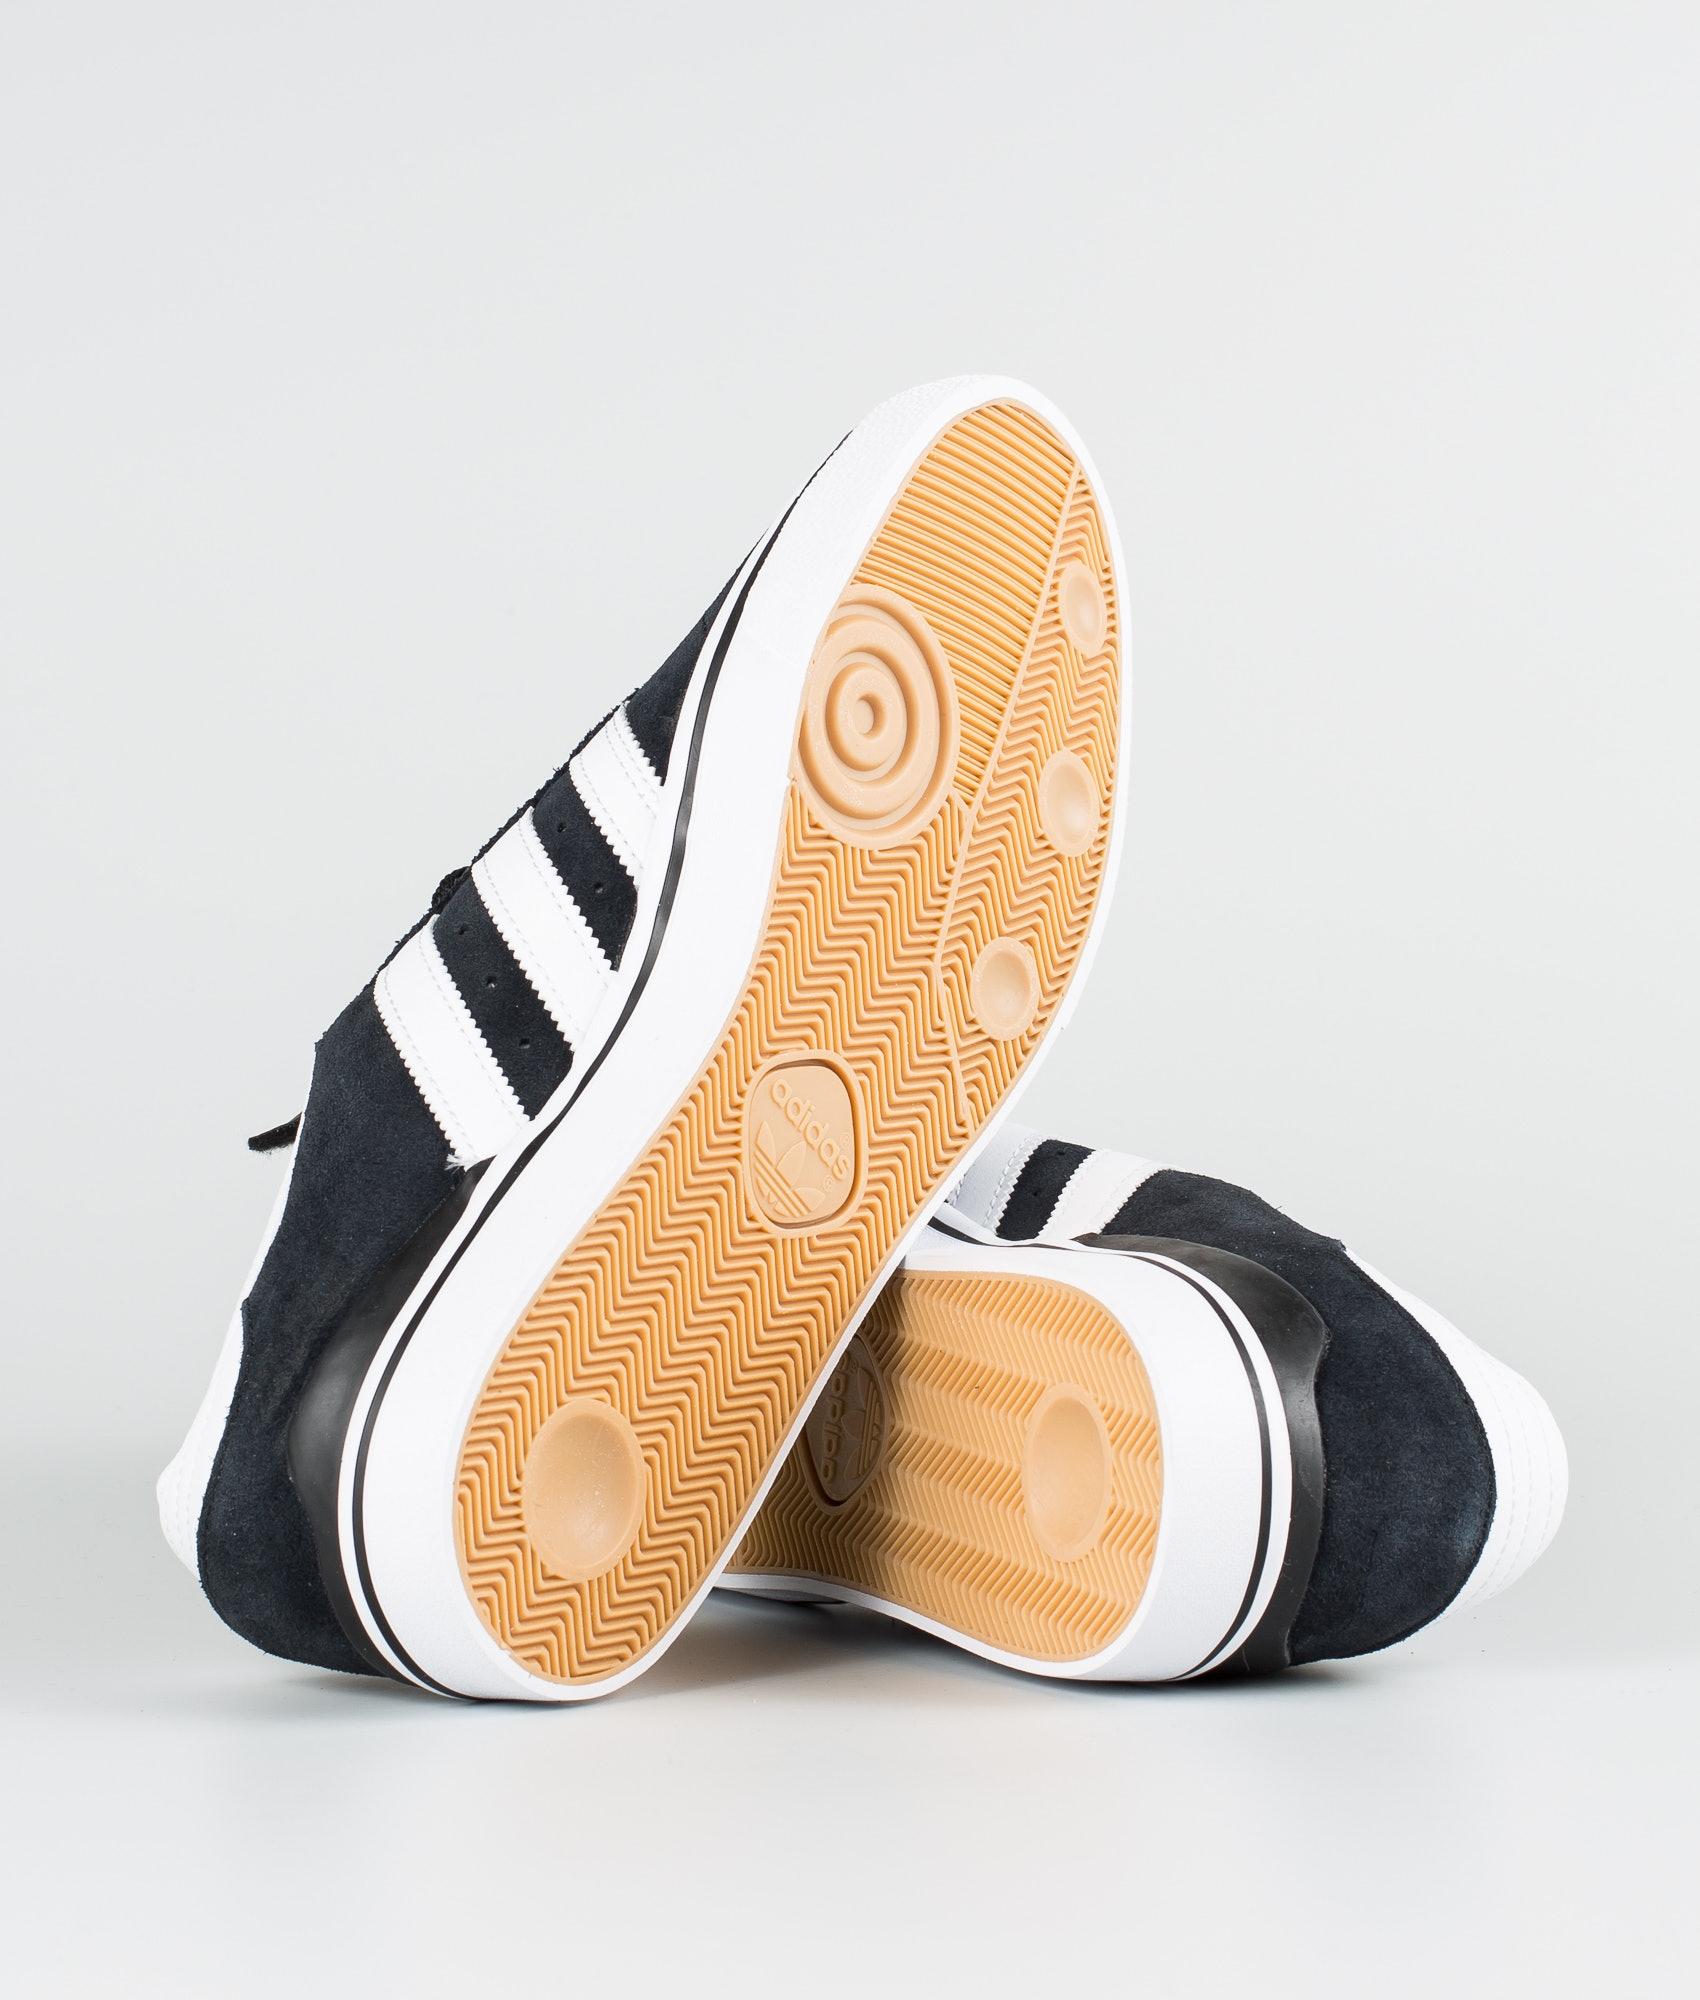 detailed look 2ee13 3f4b1 Adidas Skateboarding Busenitz Vulc Schoenen